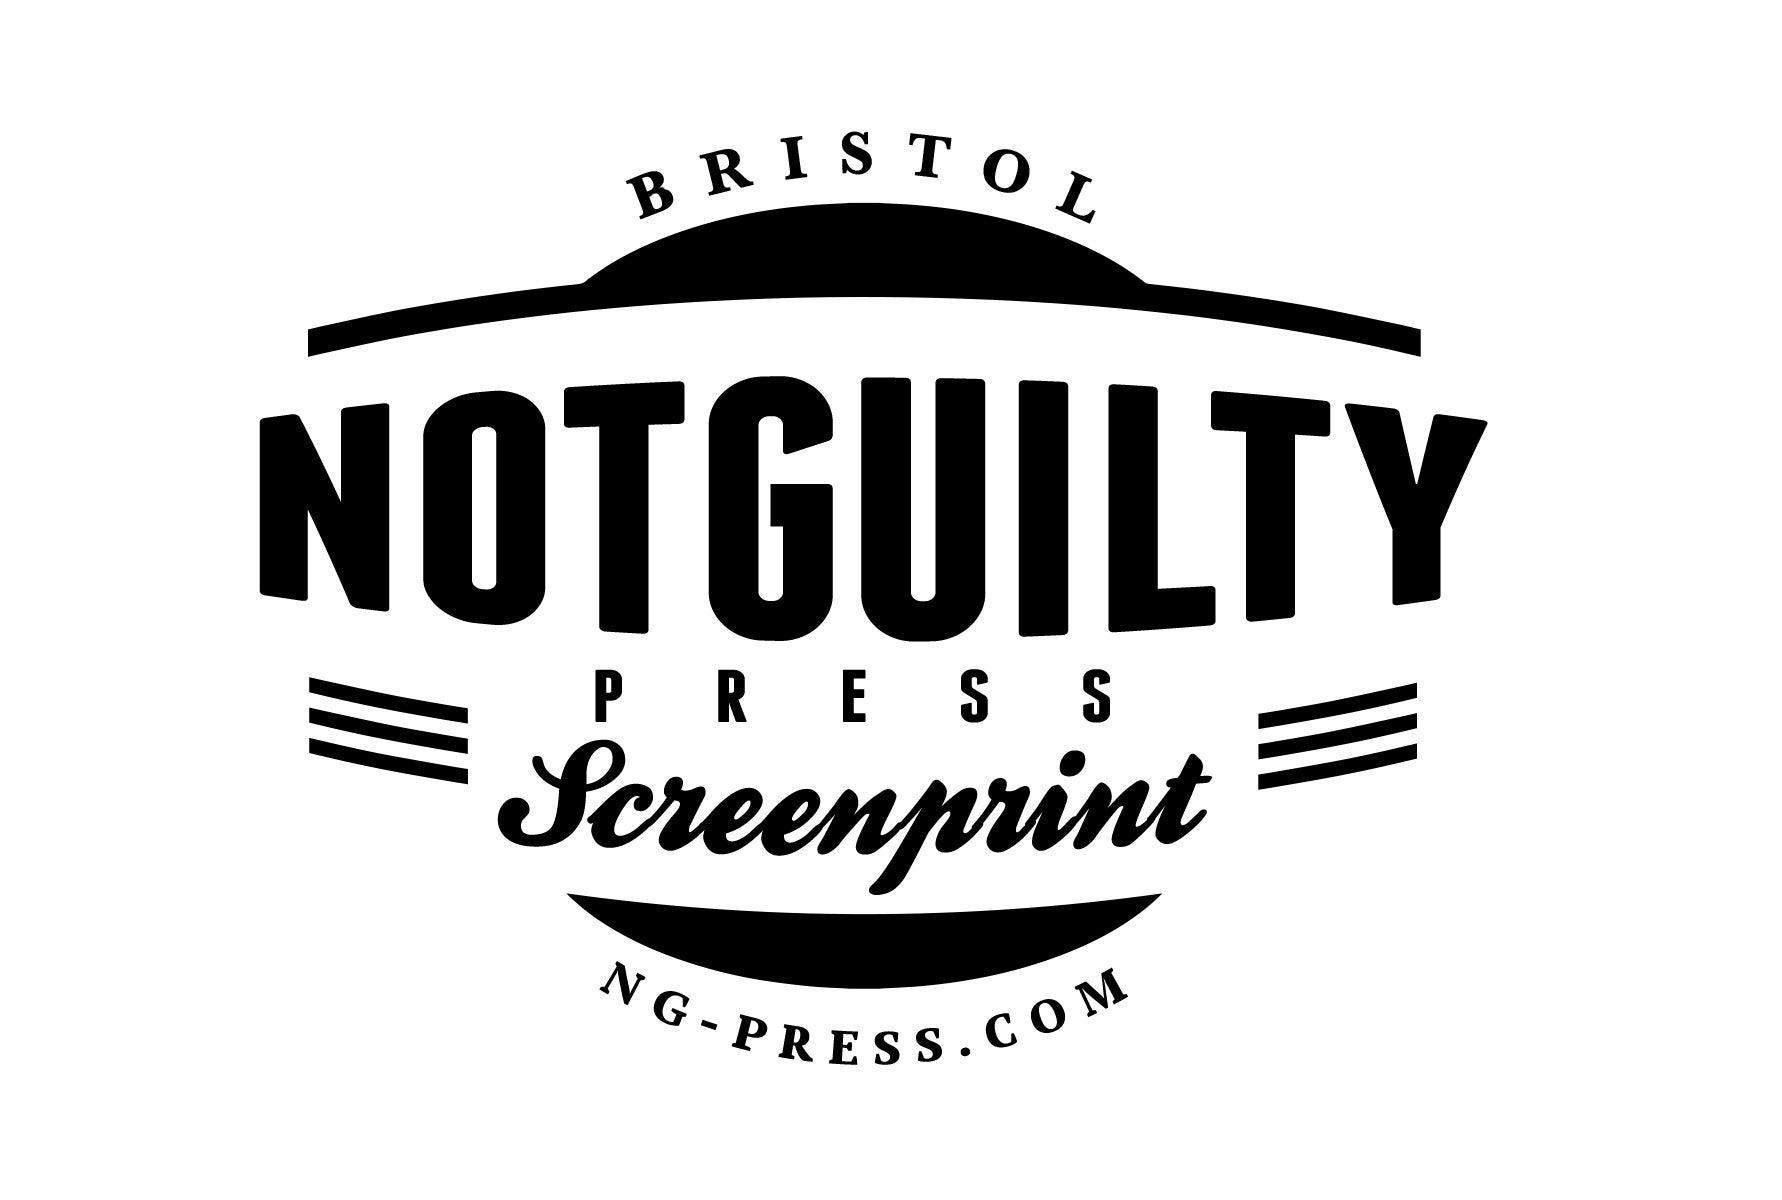 NotGuilty Magazine & Garmshouse